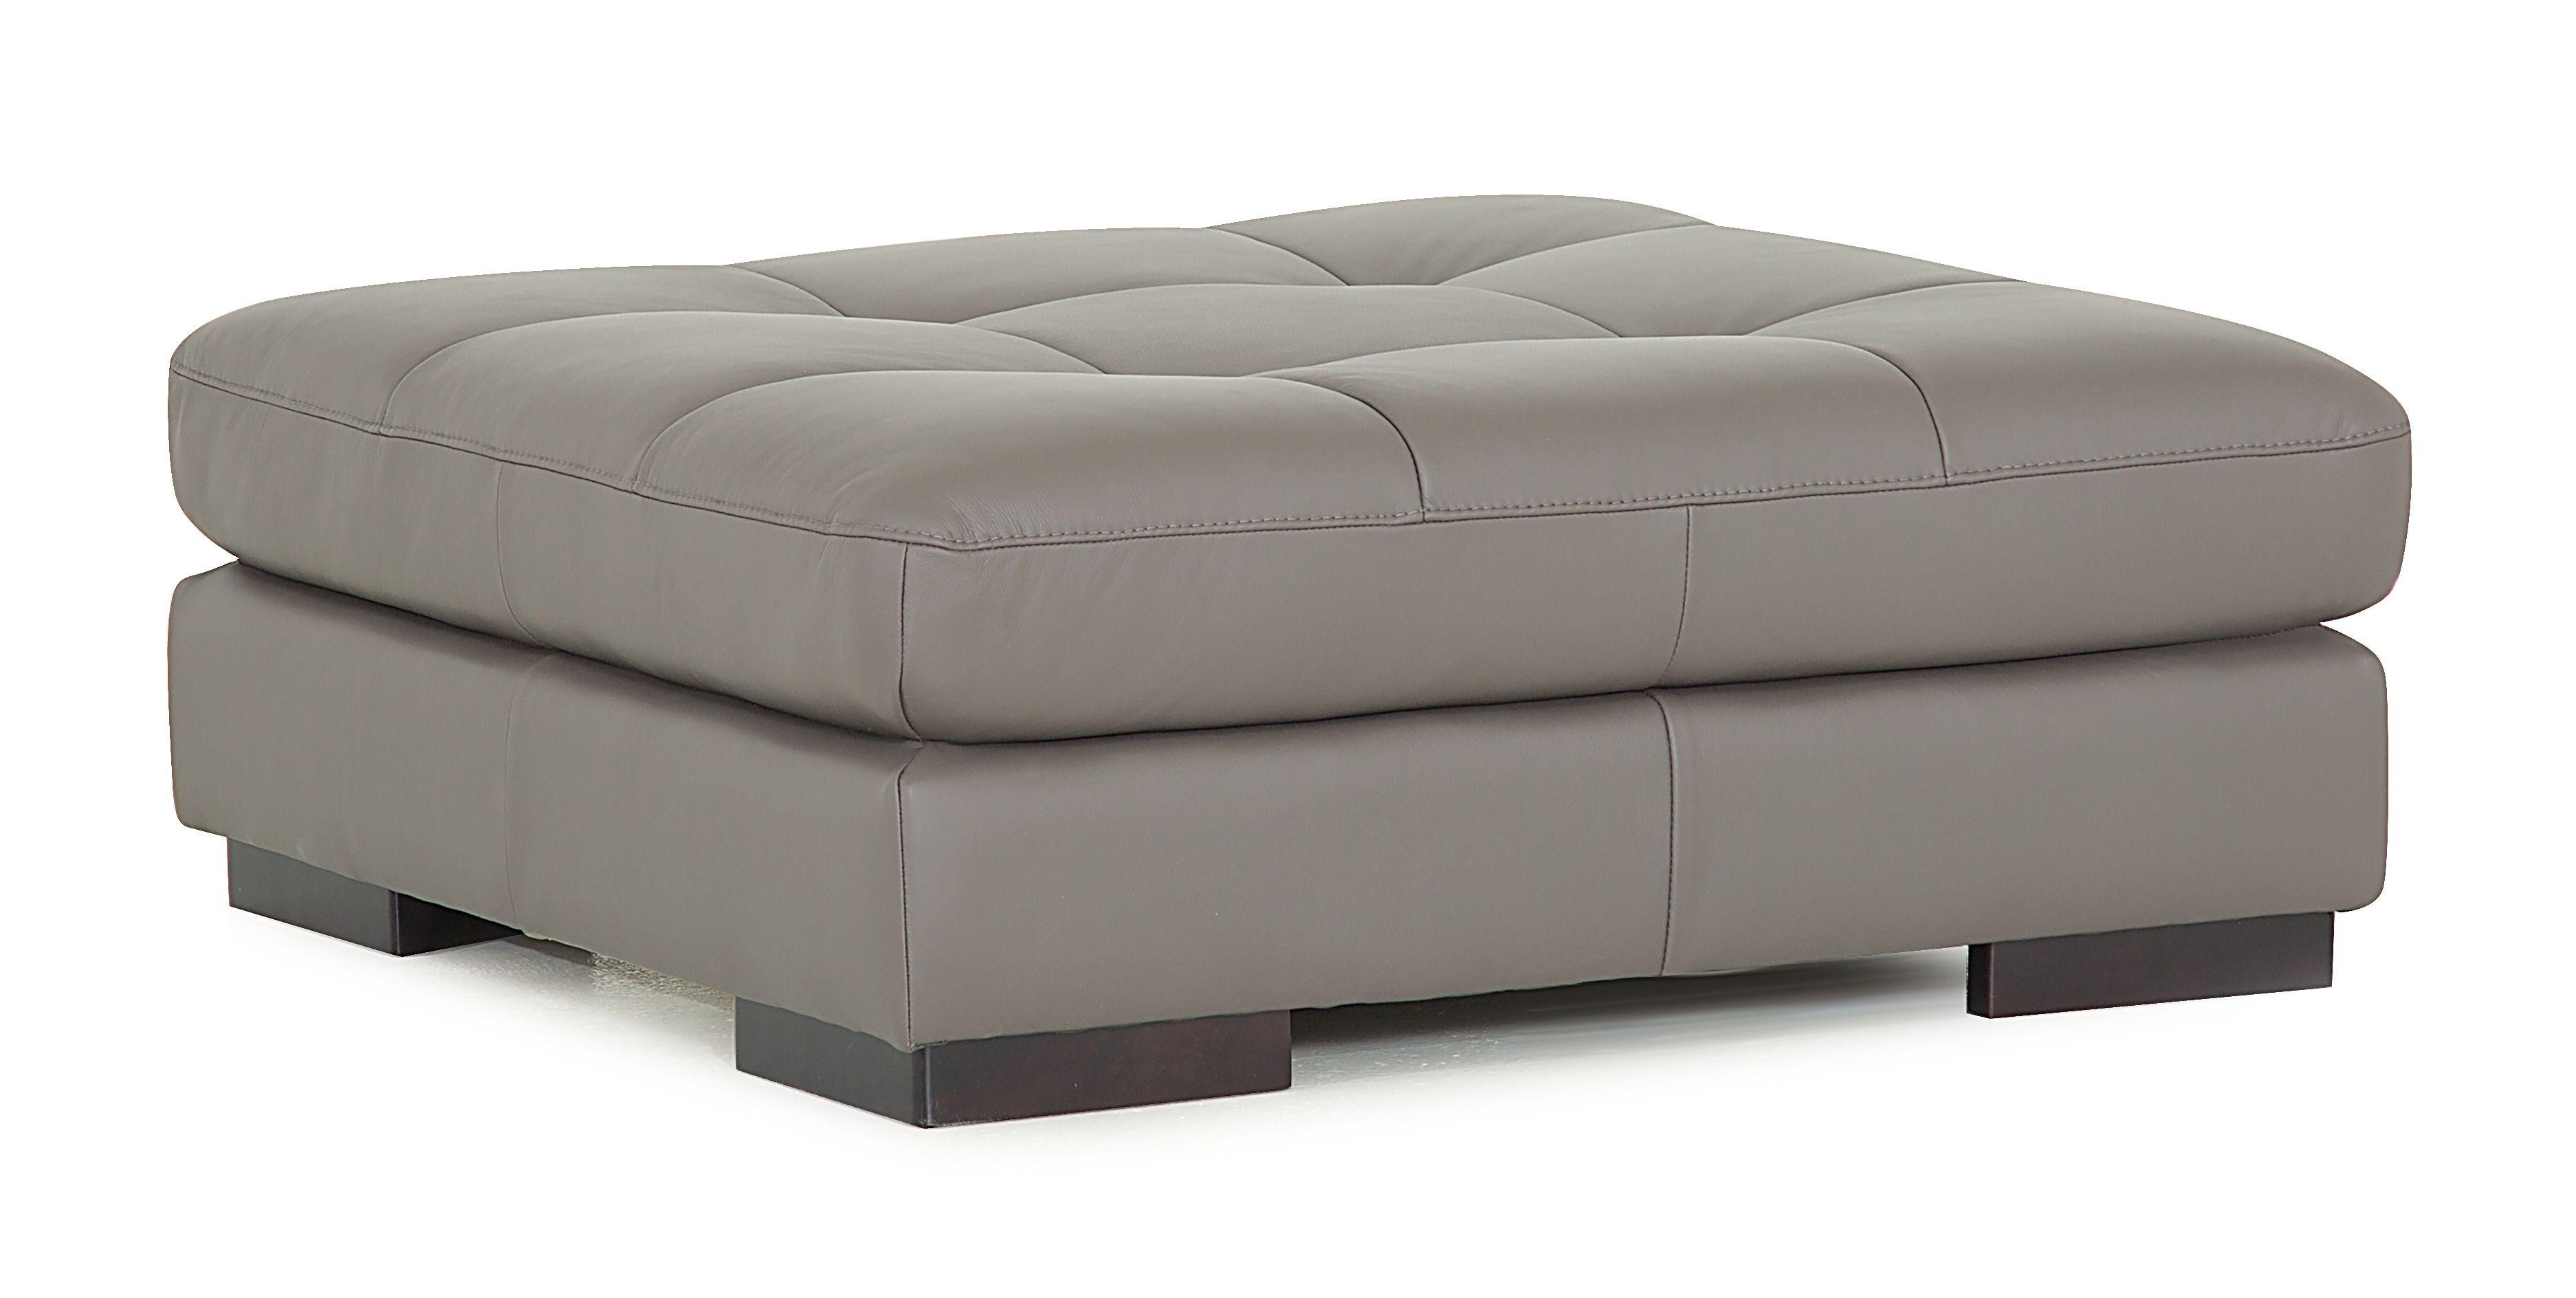 Palliser Furniture Miami Ottoman 77319 04